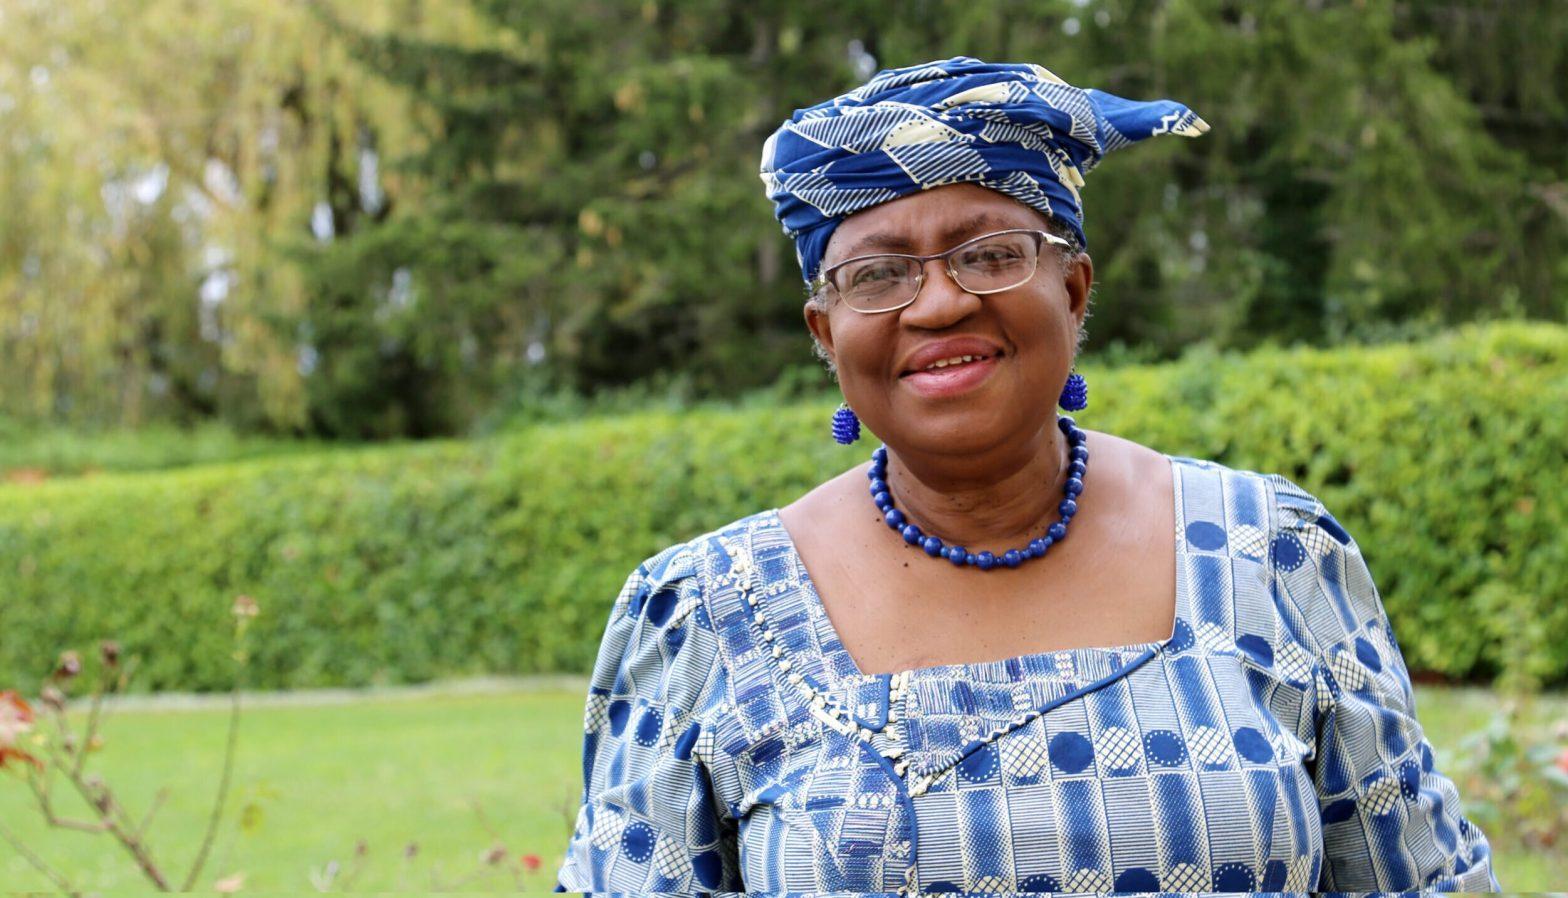 Nigeria's Okonjo-Iweala set to become first female Chief of WTO_40.1